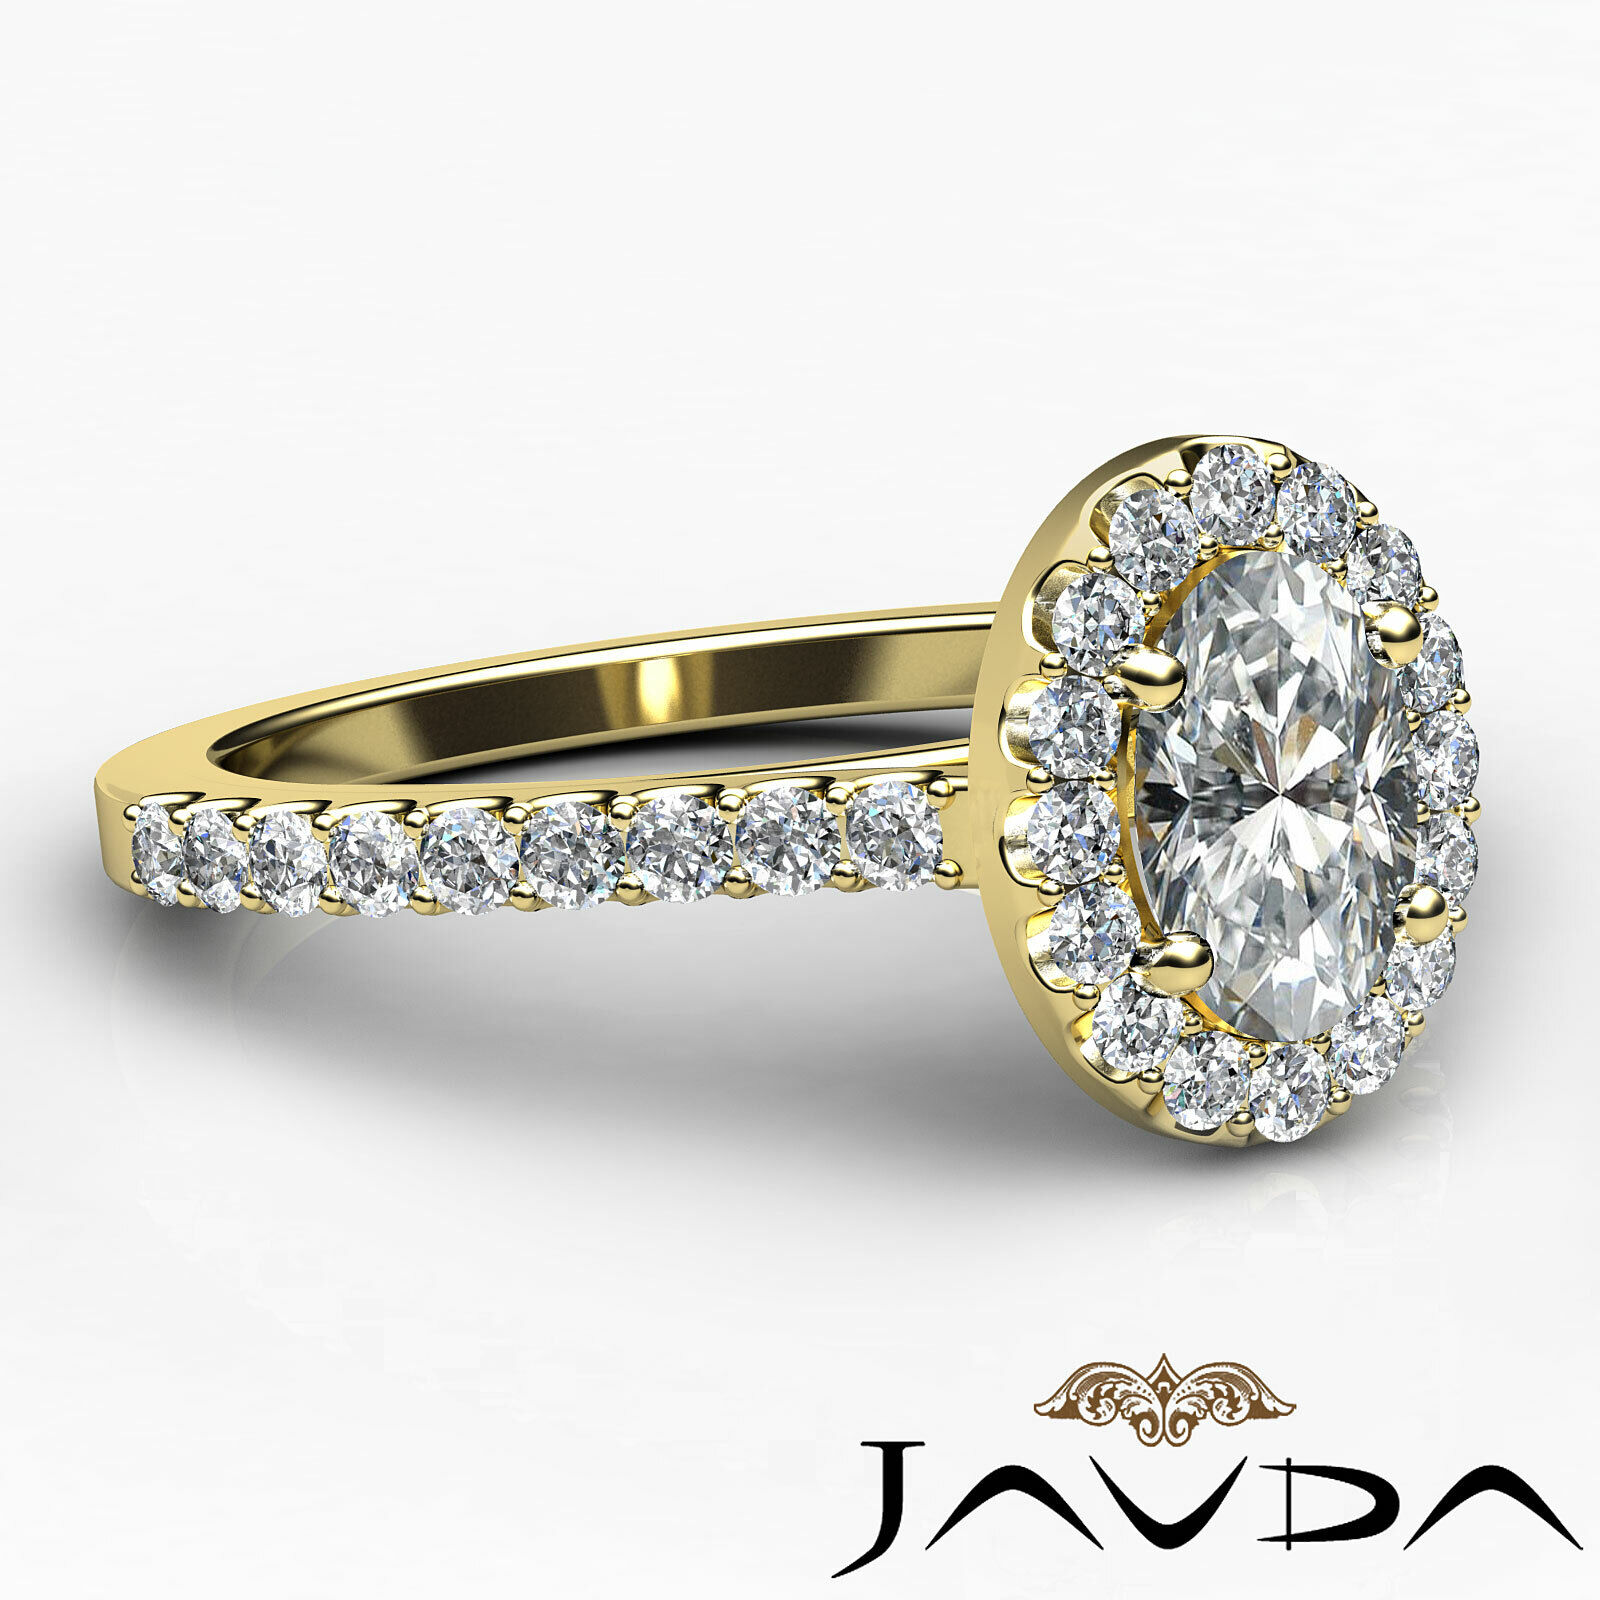 1.6ctw Prong Setting Oval Diamond Engagement Ring GIA H-VS1 White Gold Women New 9